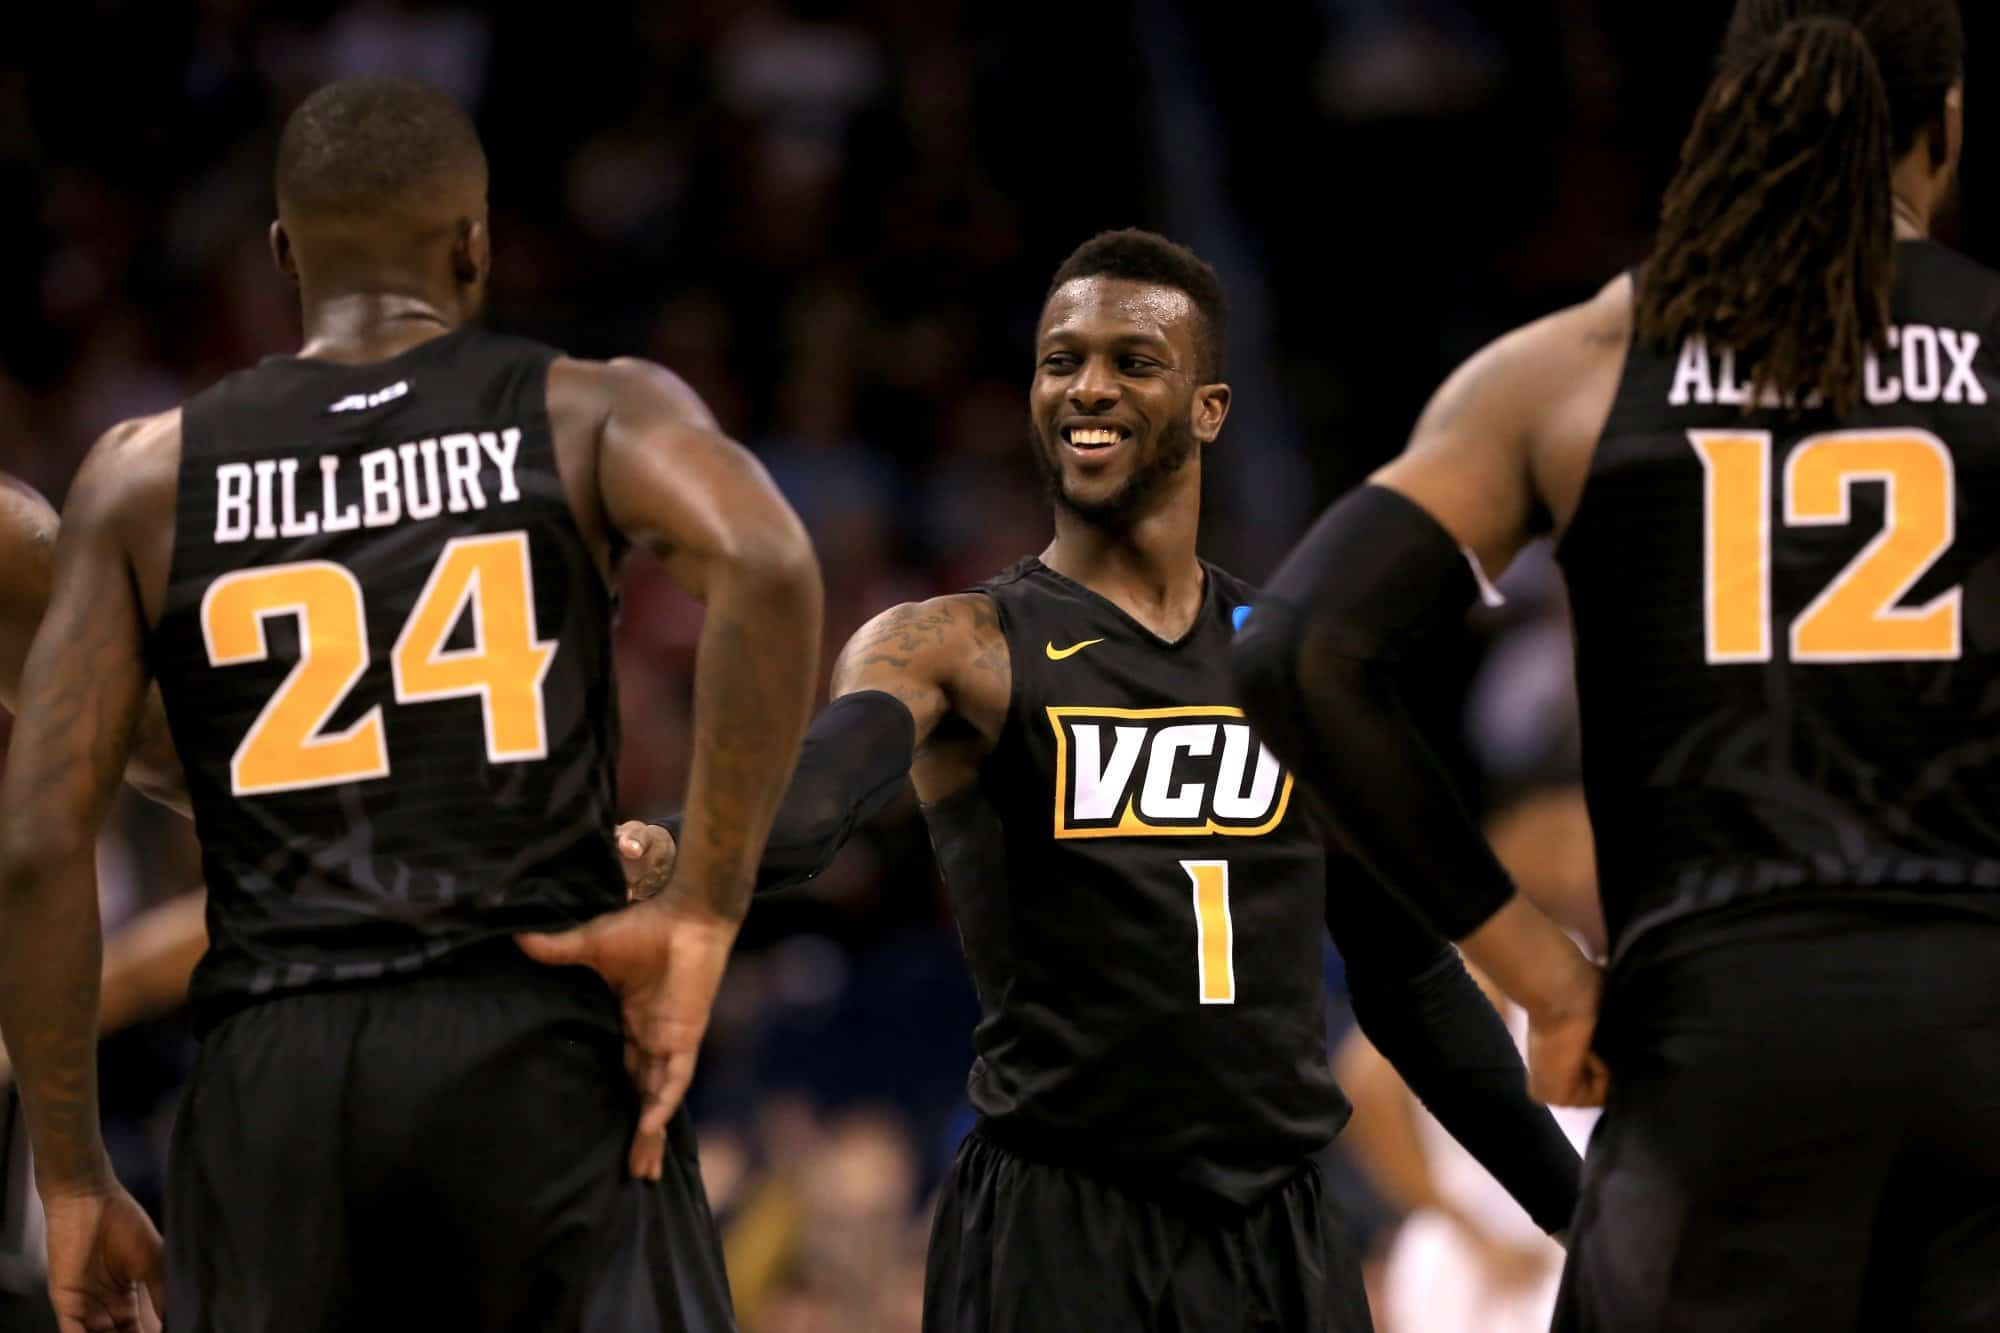 Ncaa basketball - VCU Rams